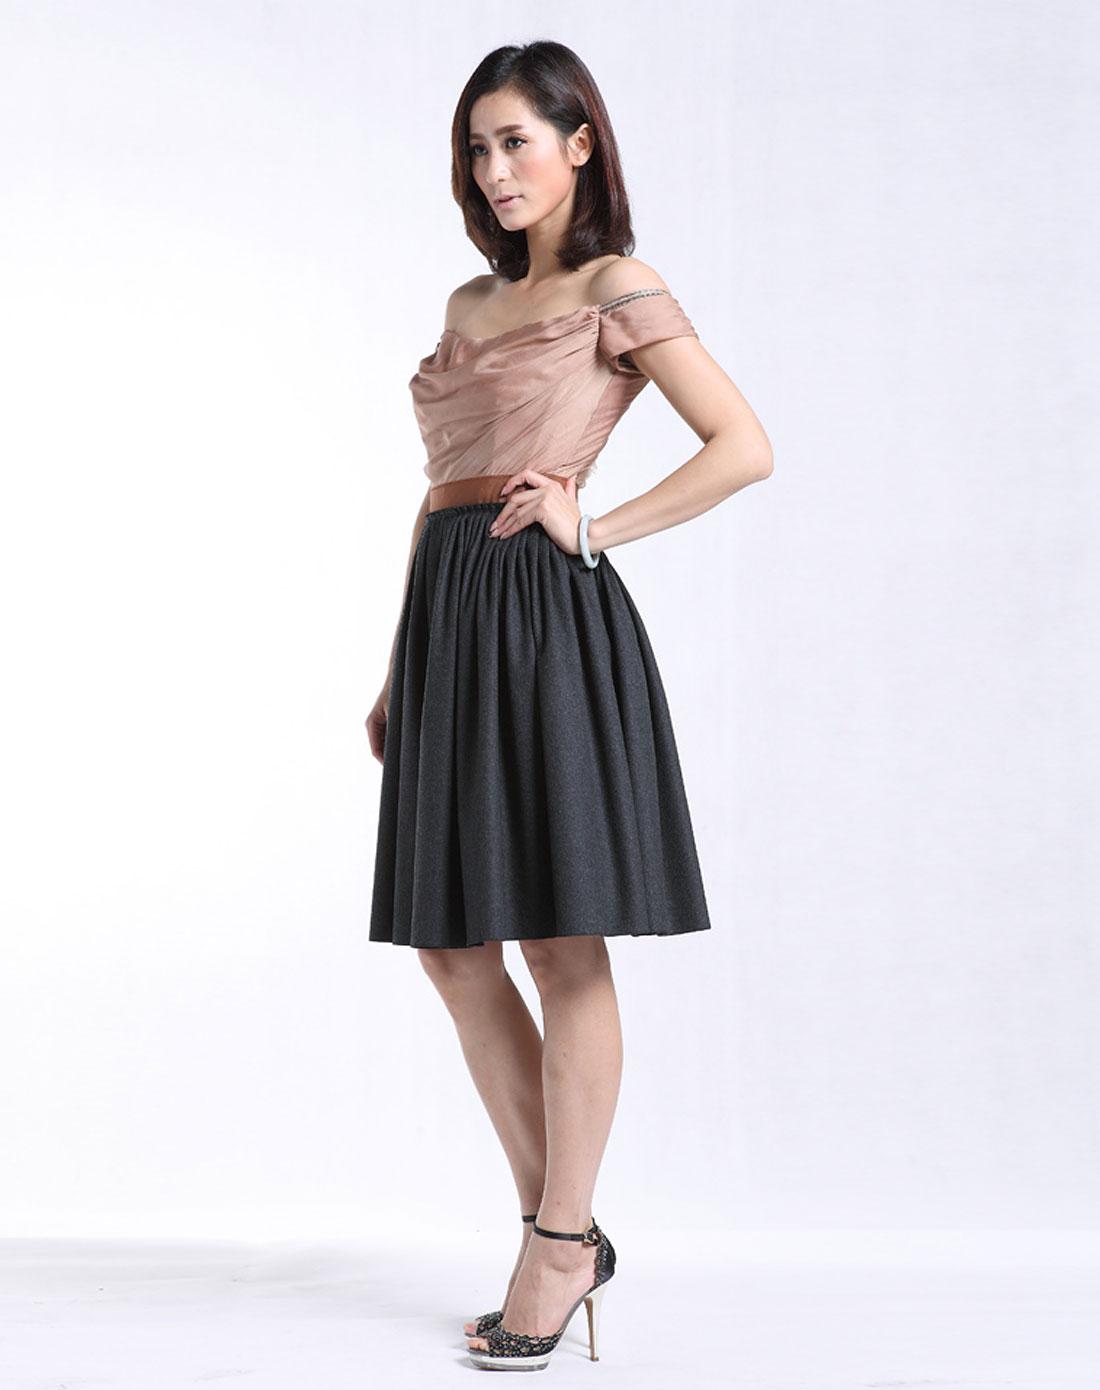 d&g 女优雅性感晚礼服式连衣裙